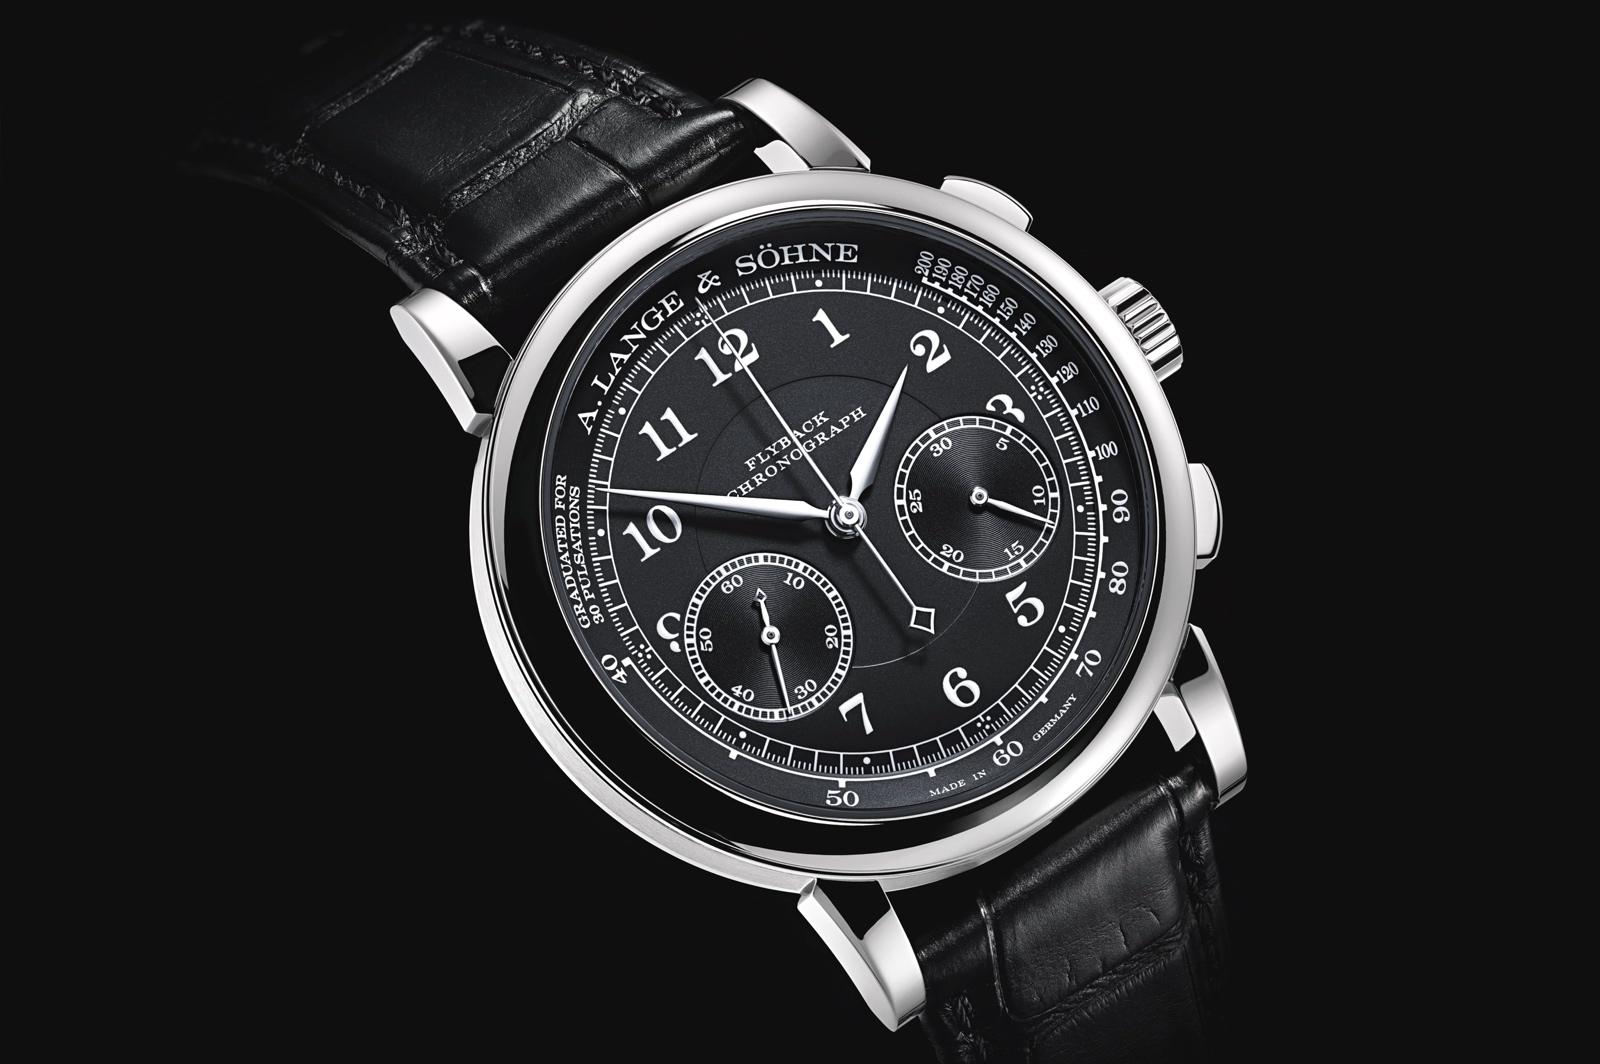 Lange 1815 Chronograph 1